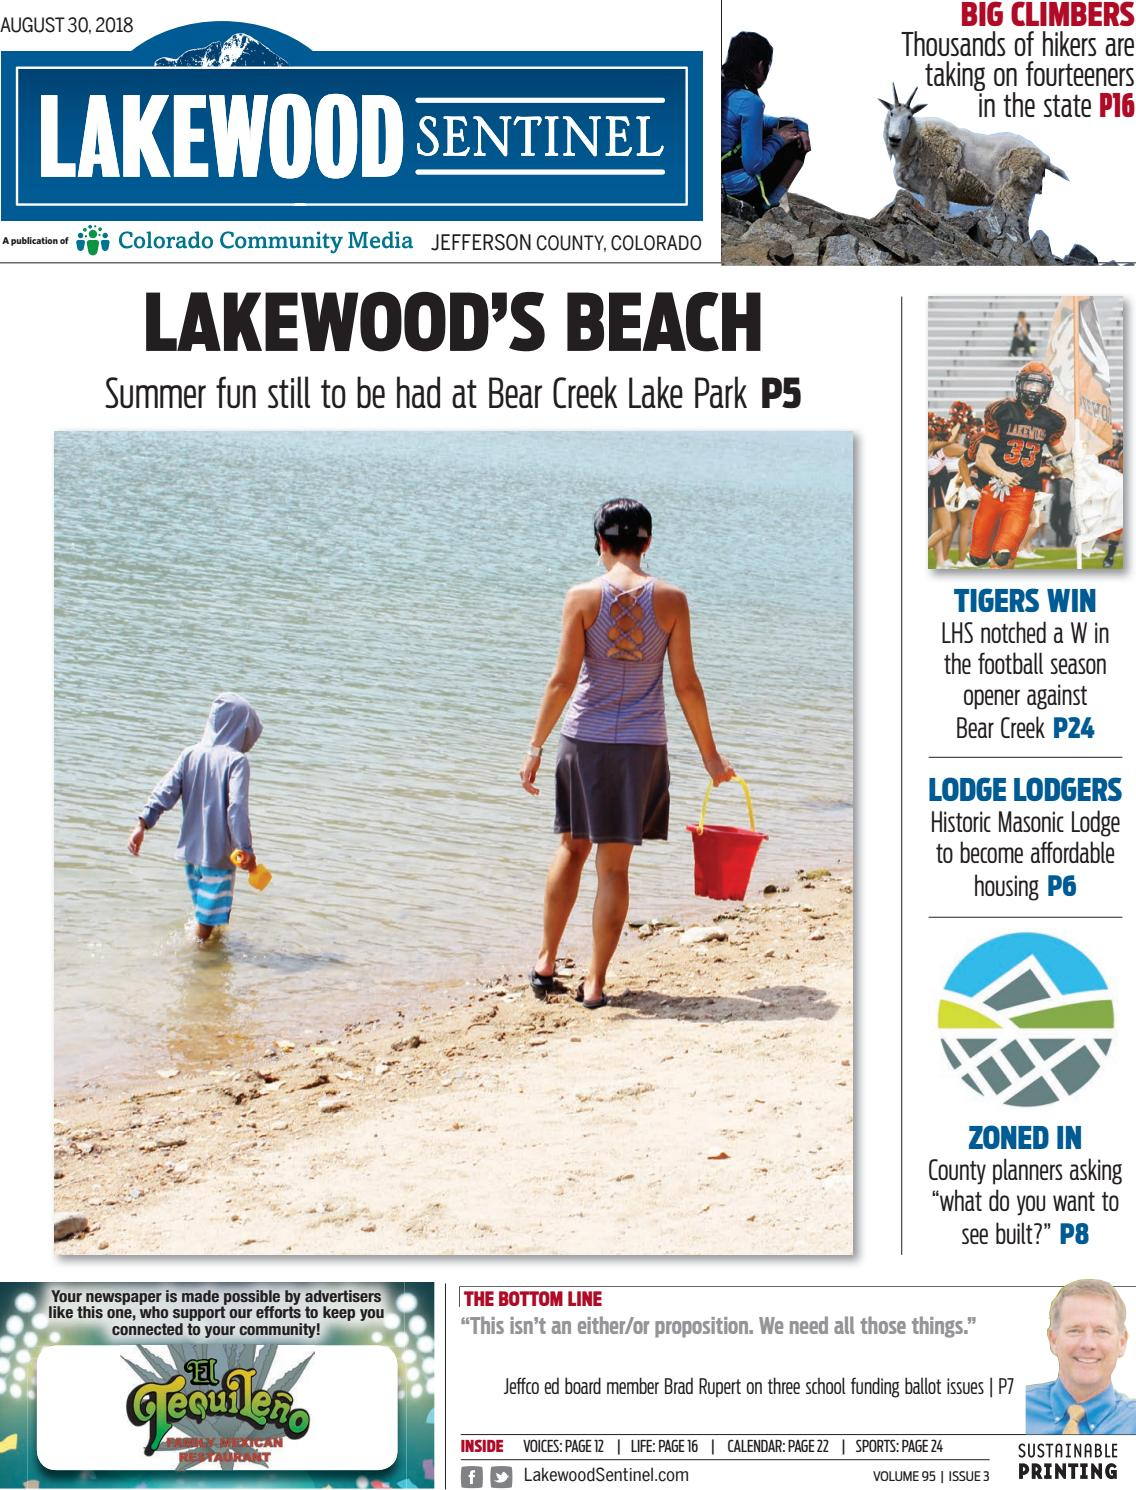 Lakewood Sentinel 0830 by Colorado Community Media - issuu